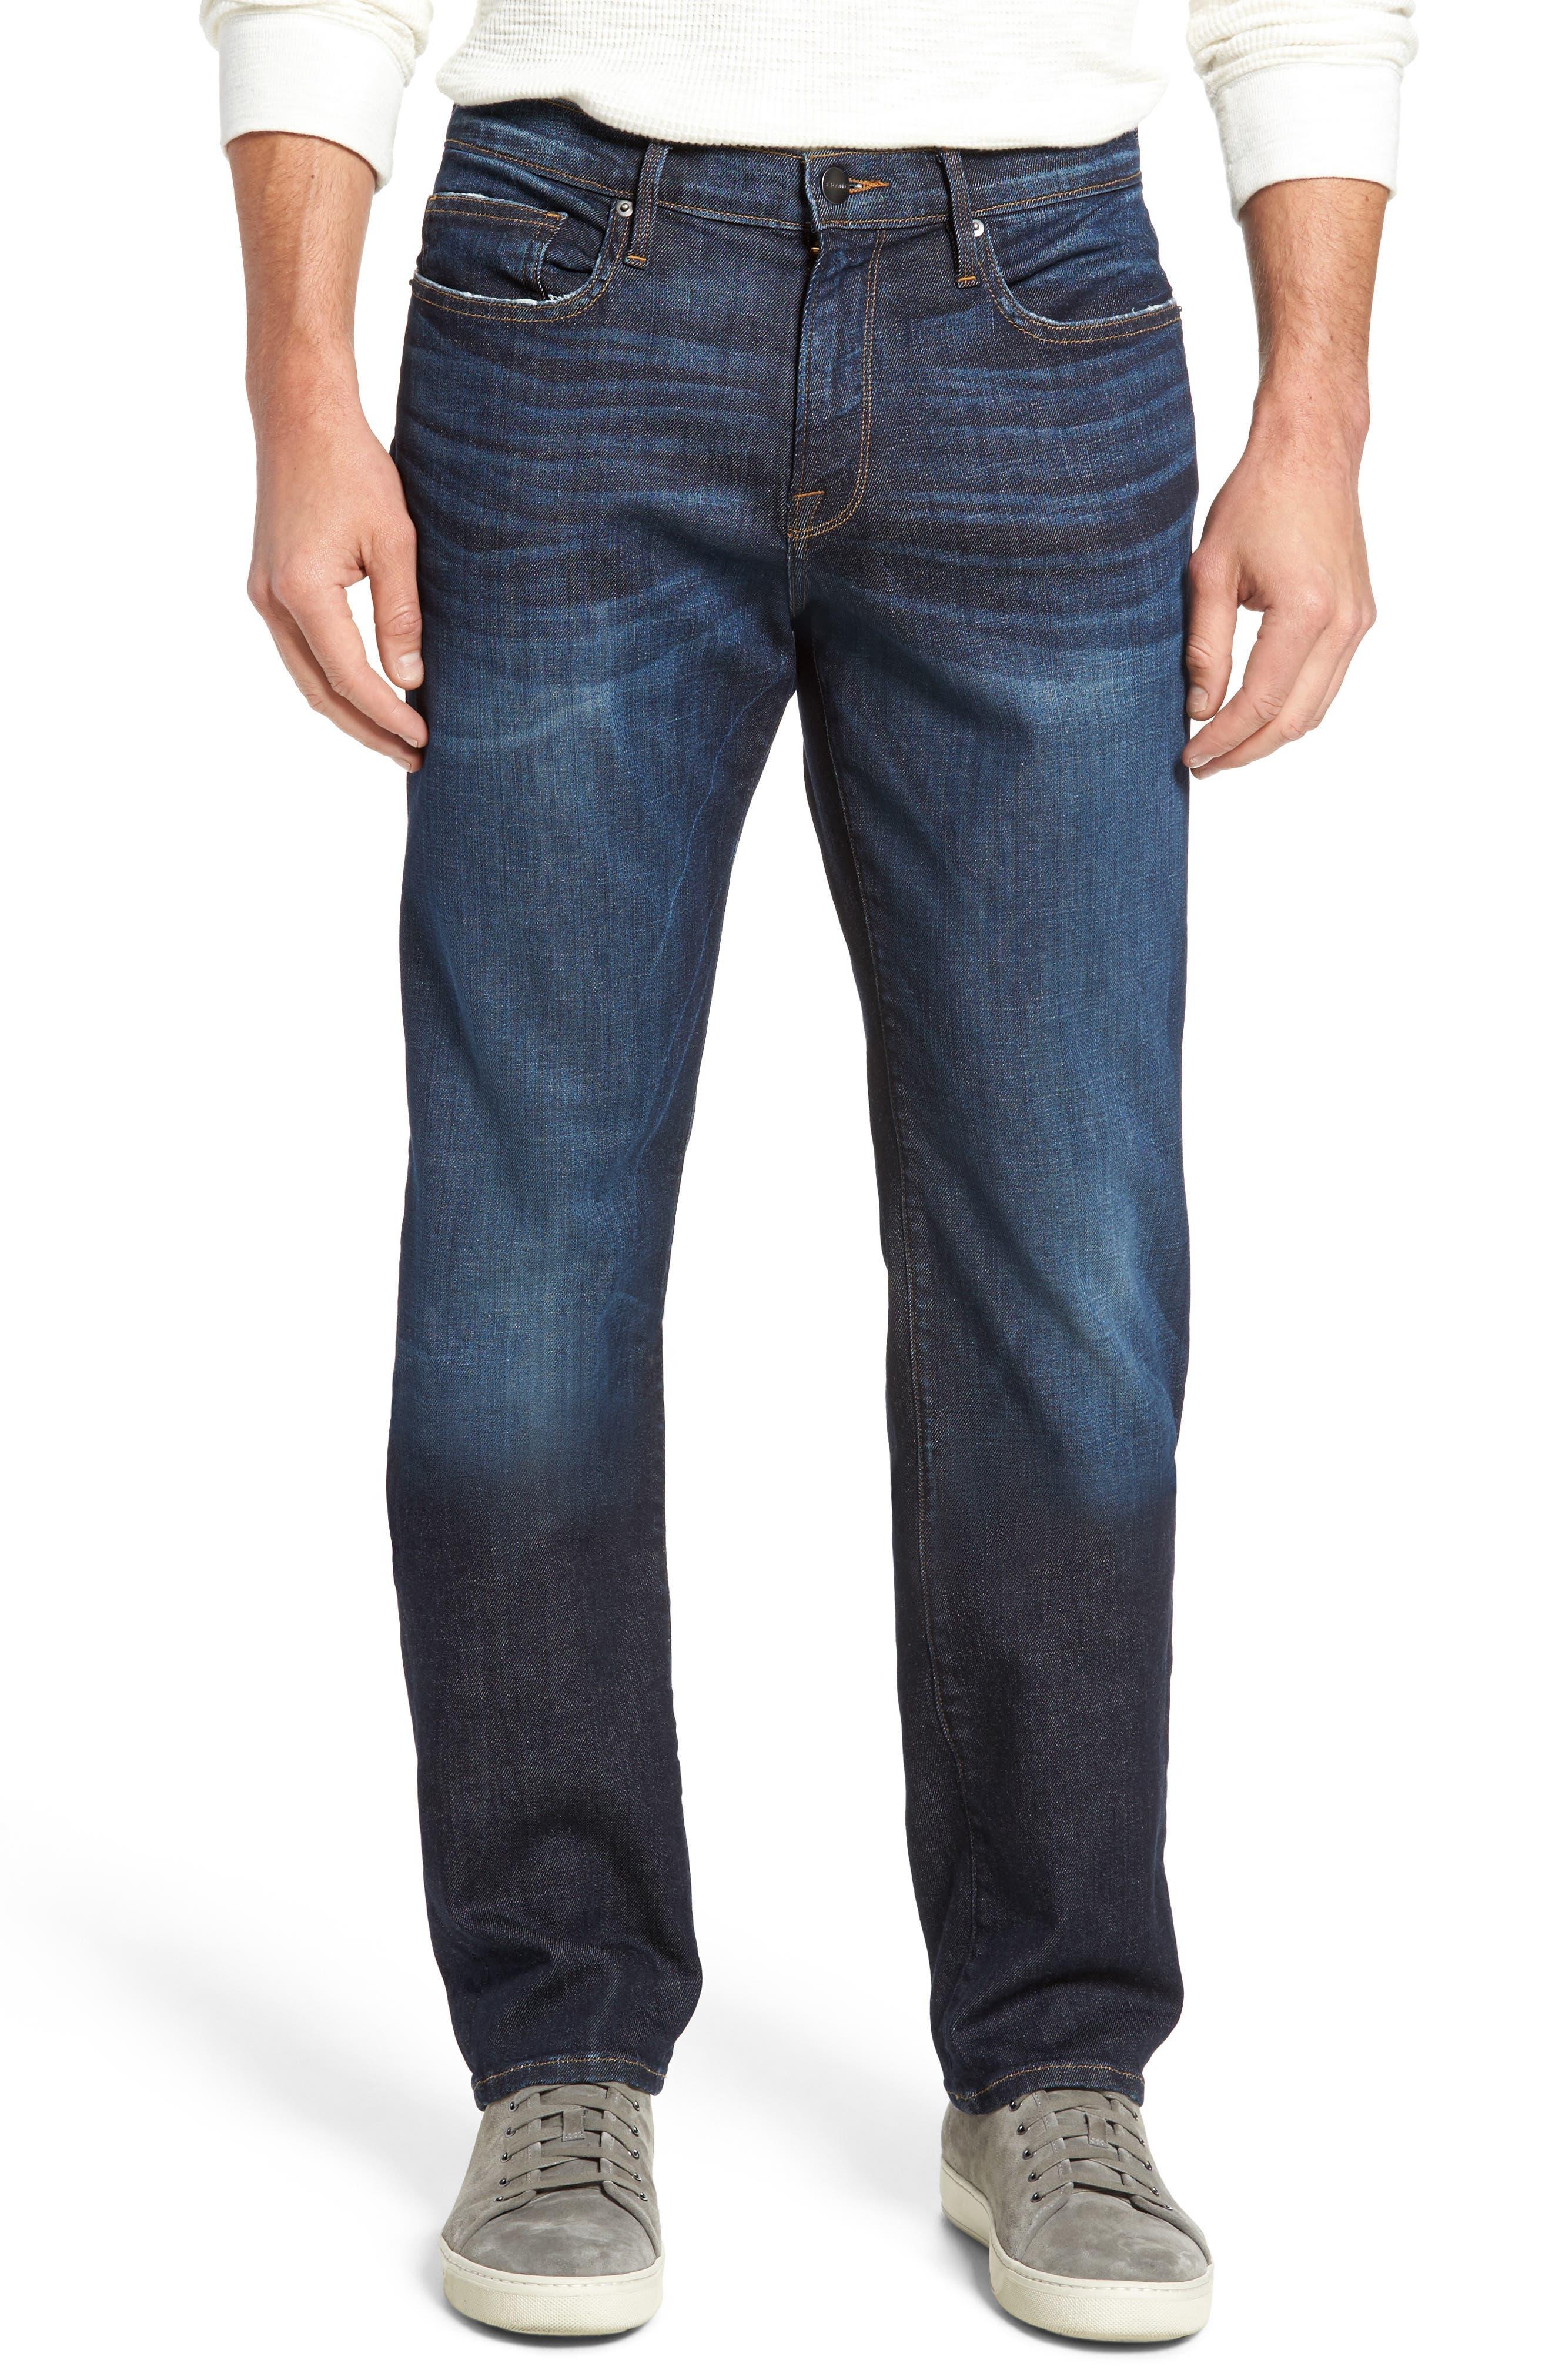 L'Homme Slim Straight Leg Jeans,                             Main thumbnail 1, color,                             401